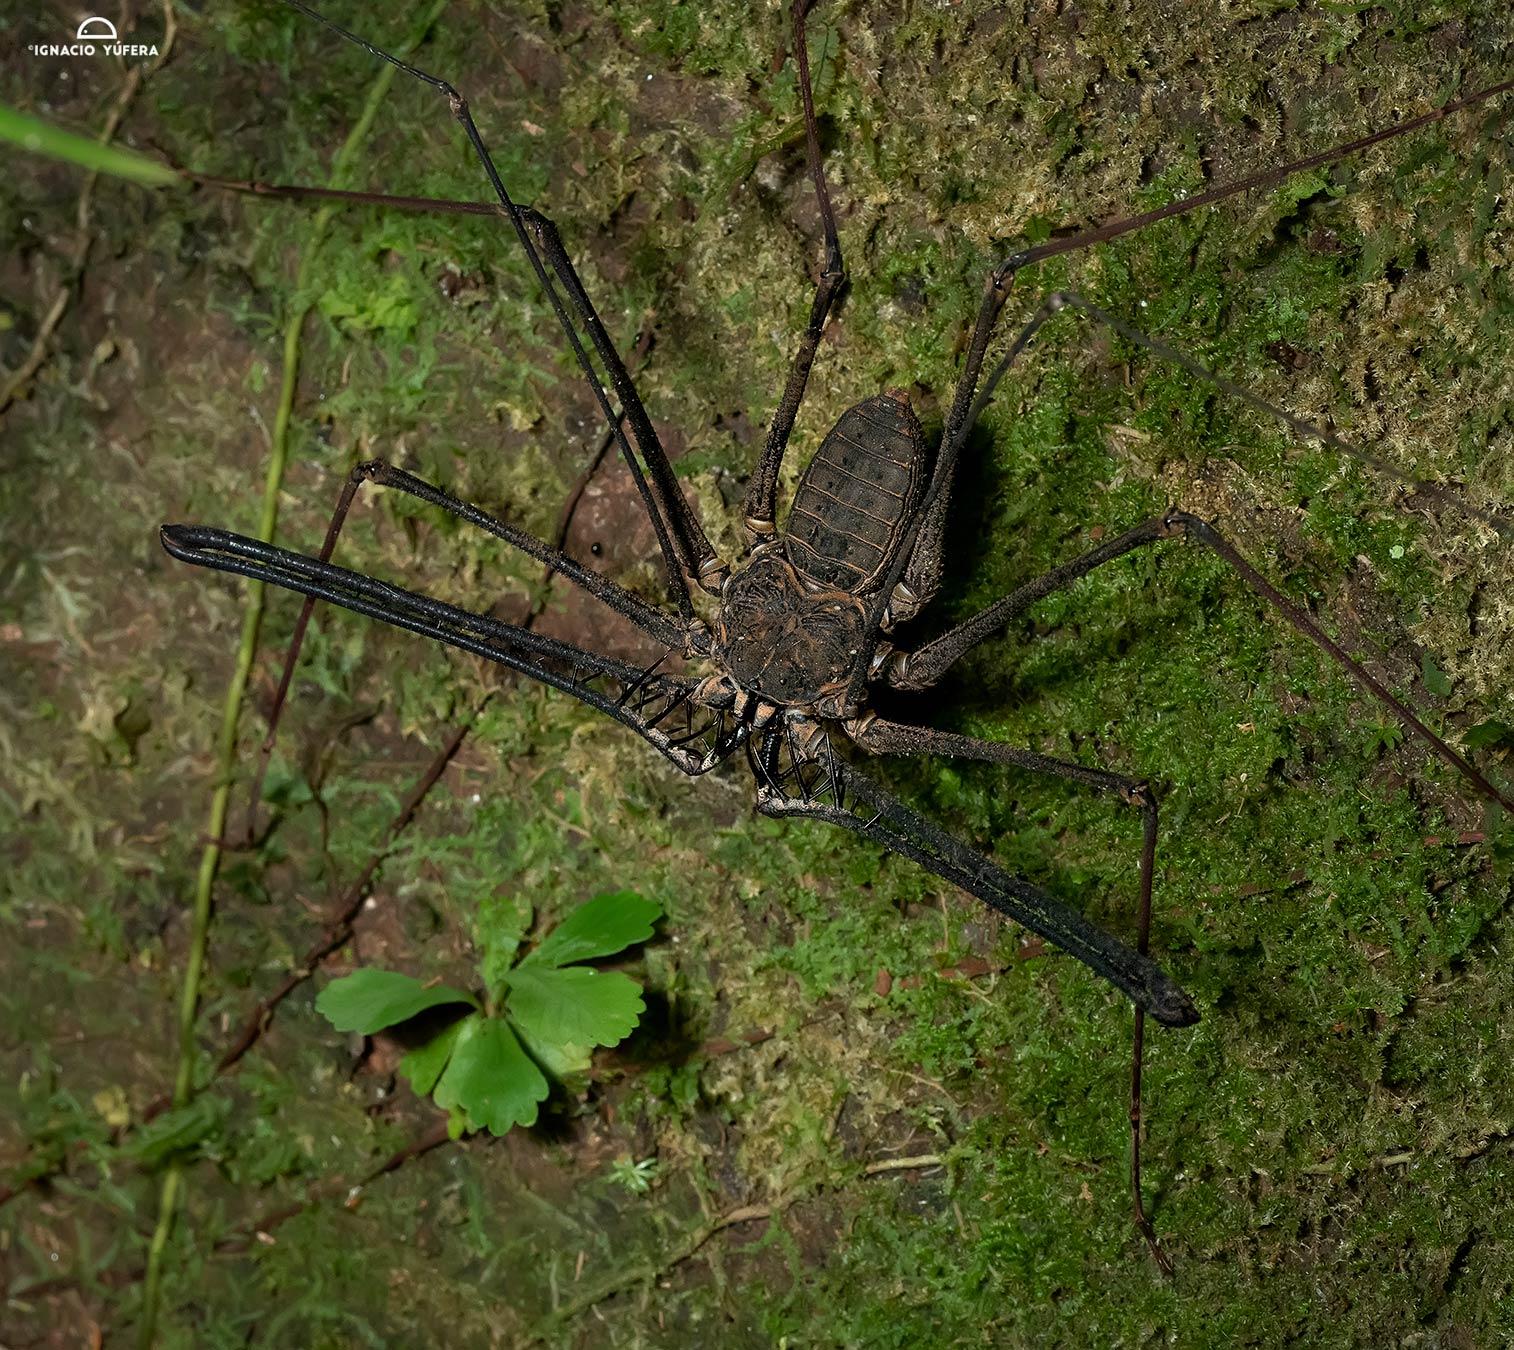 Amblypygid (Tailless Whip Scorpion), Yasuni, Ecuador